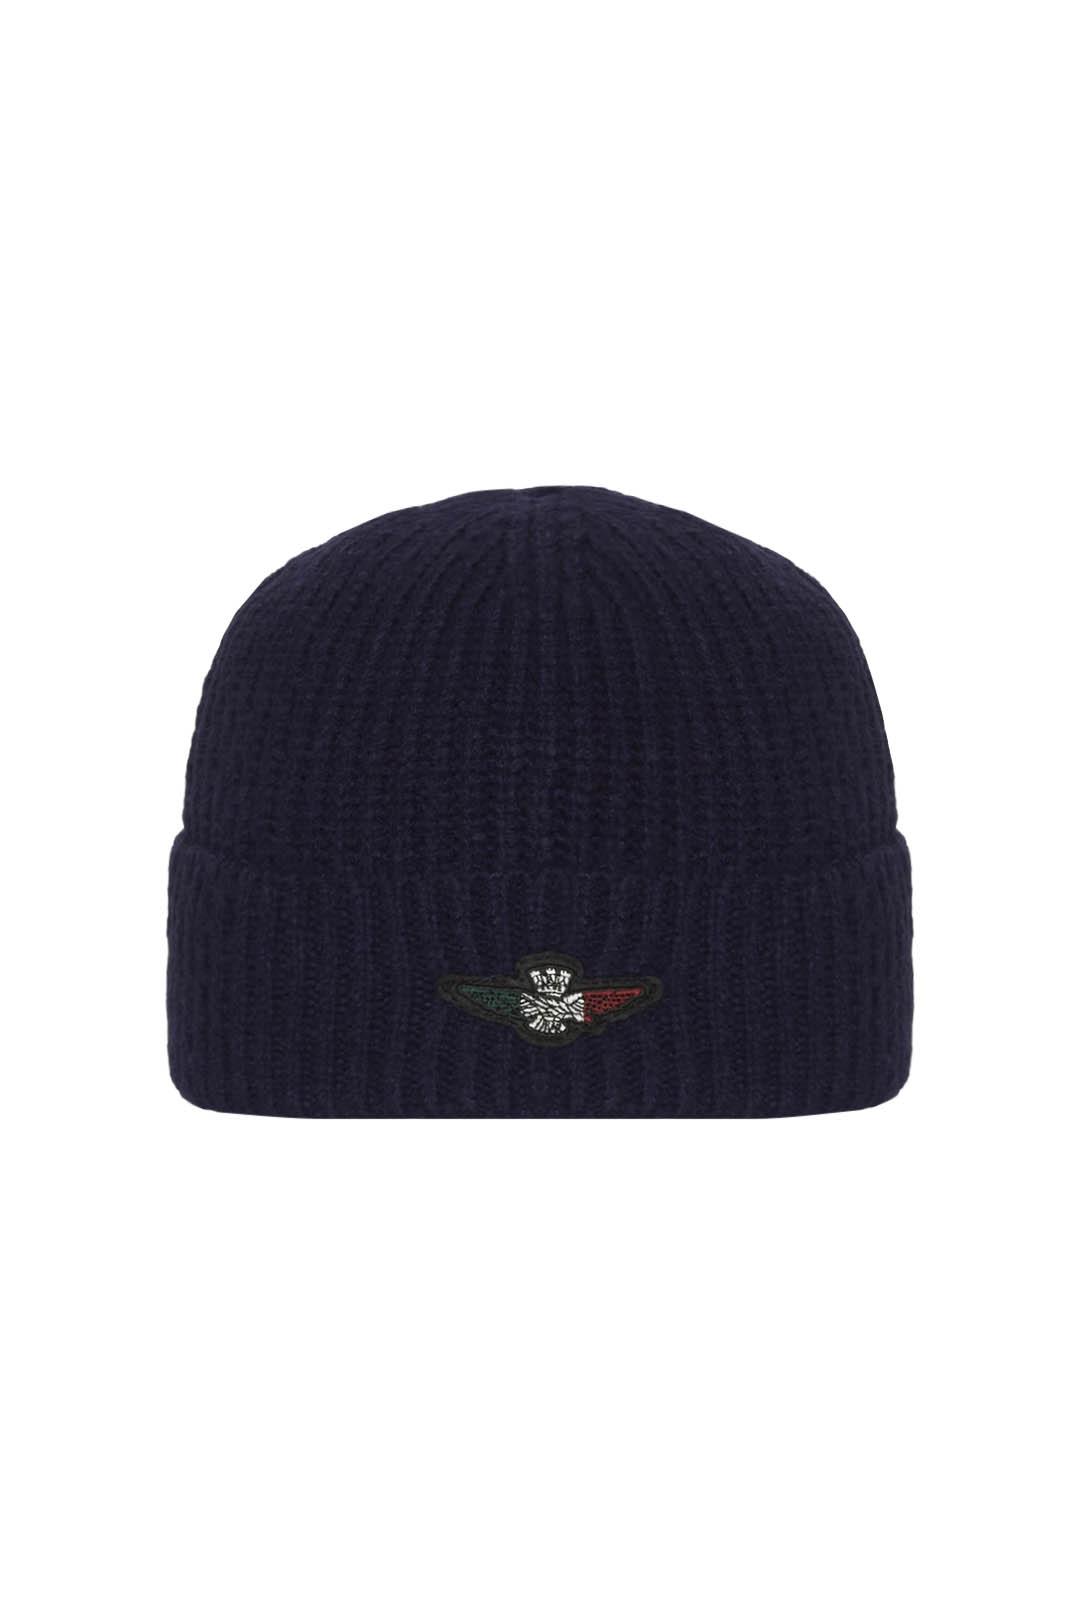 Knit cap with tricolor eagle patch       1